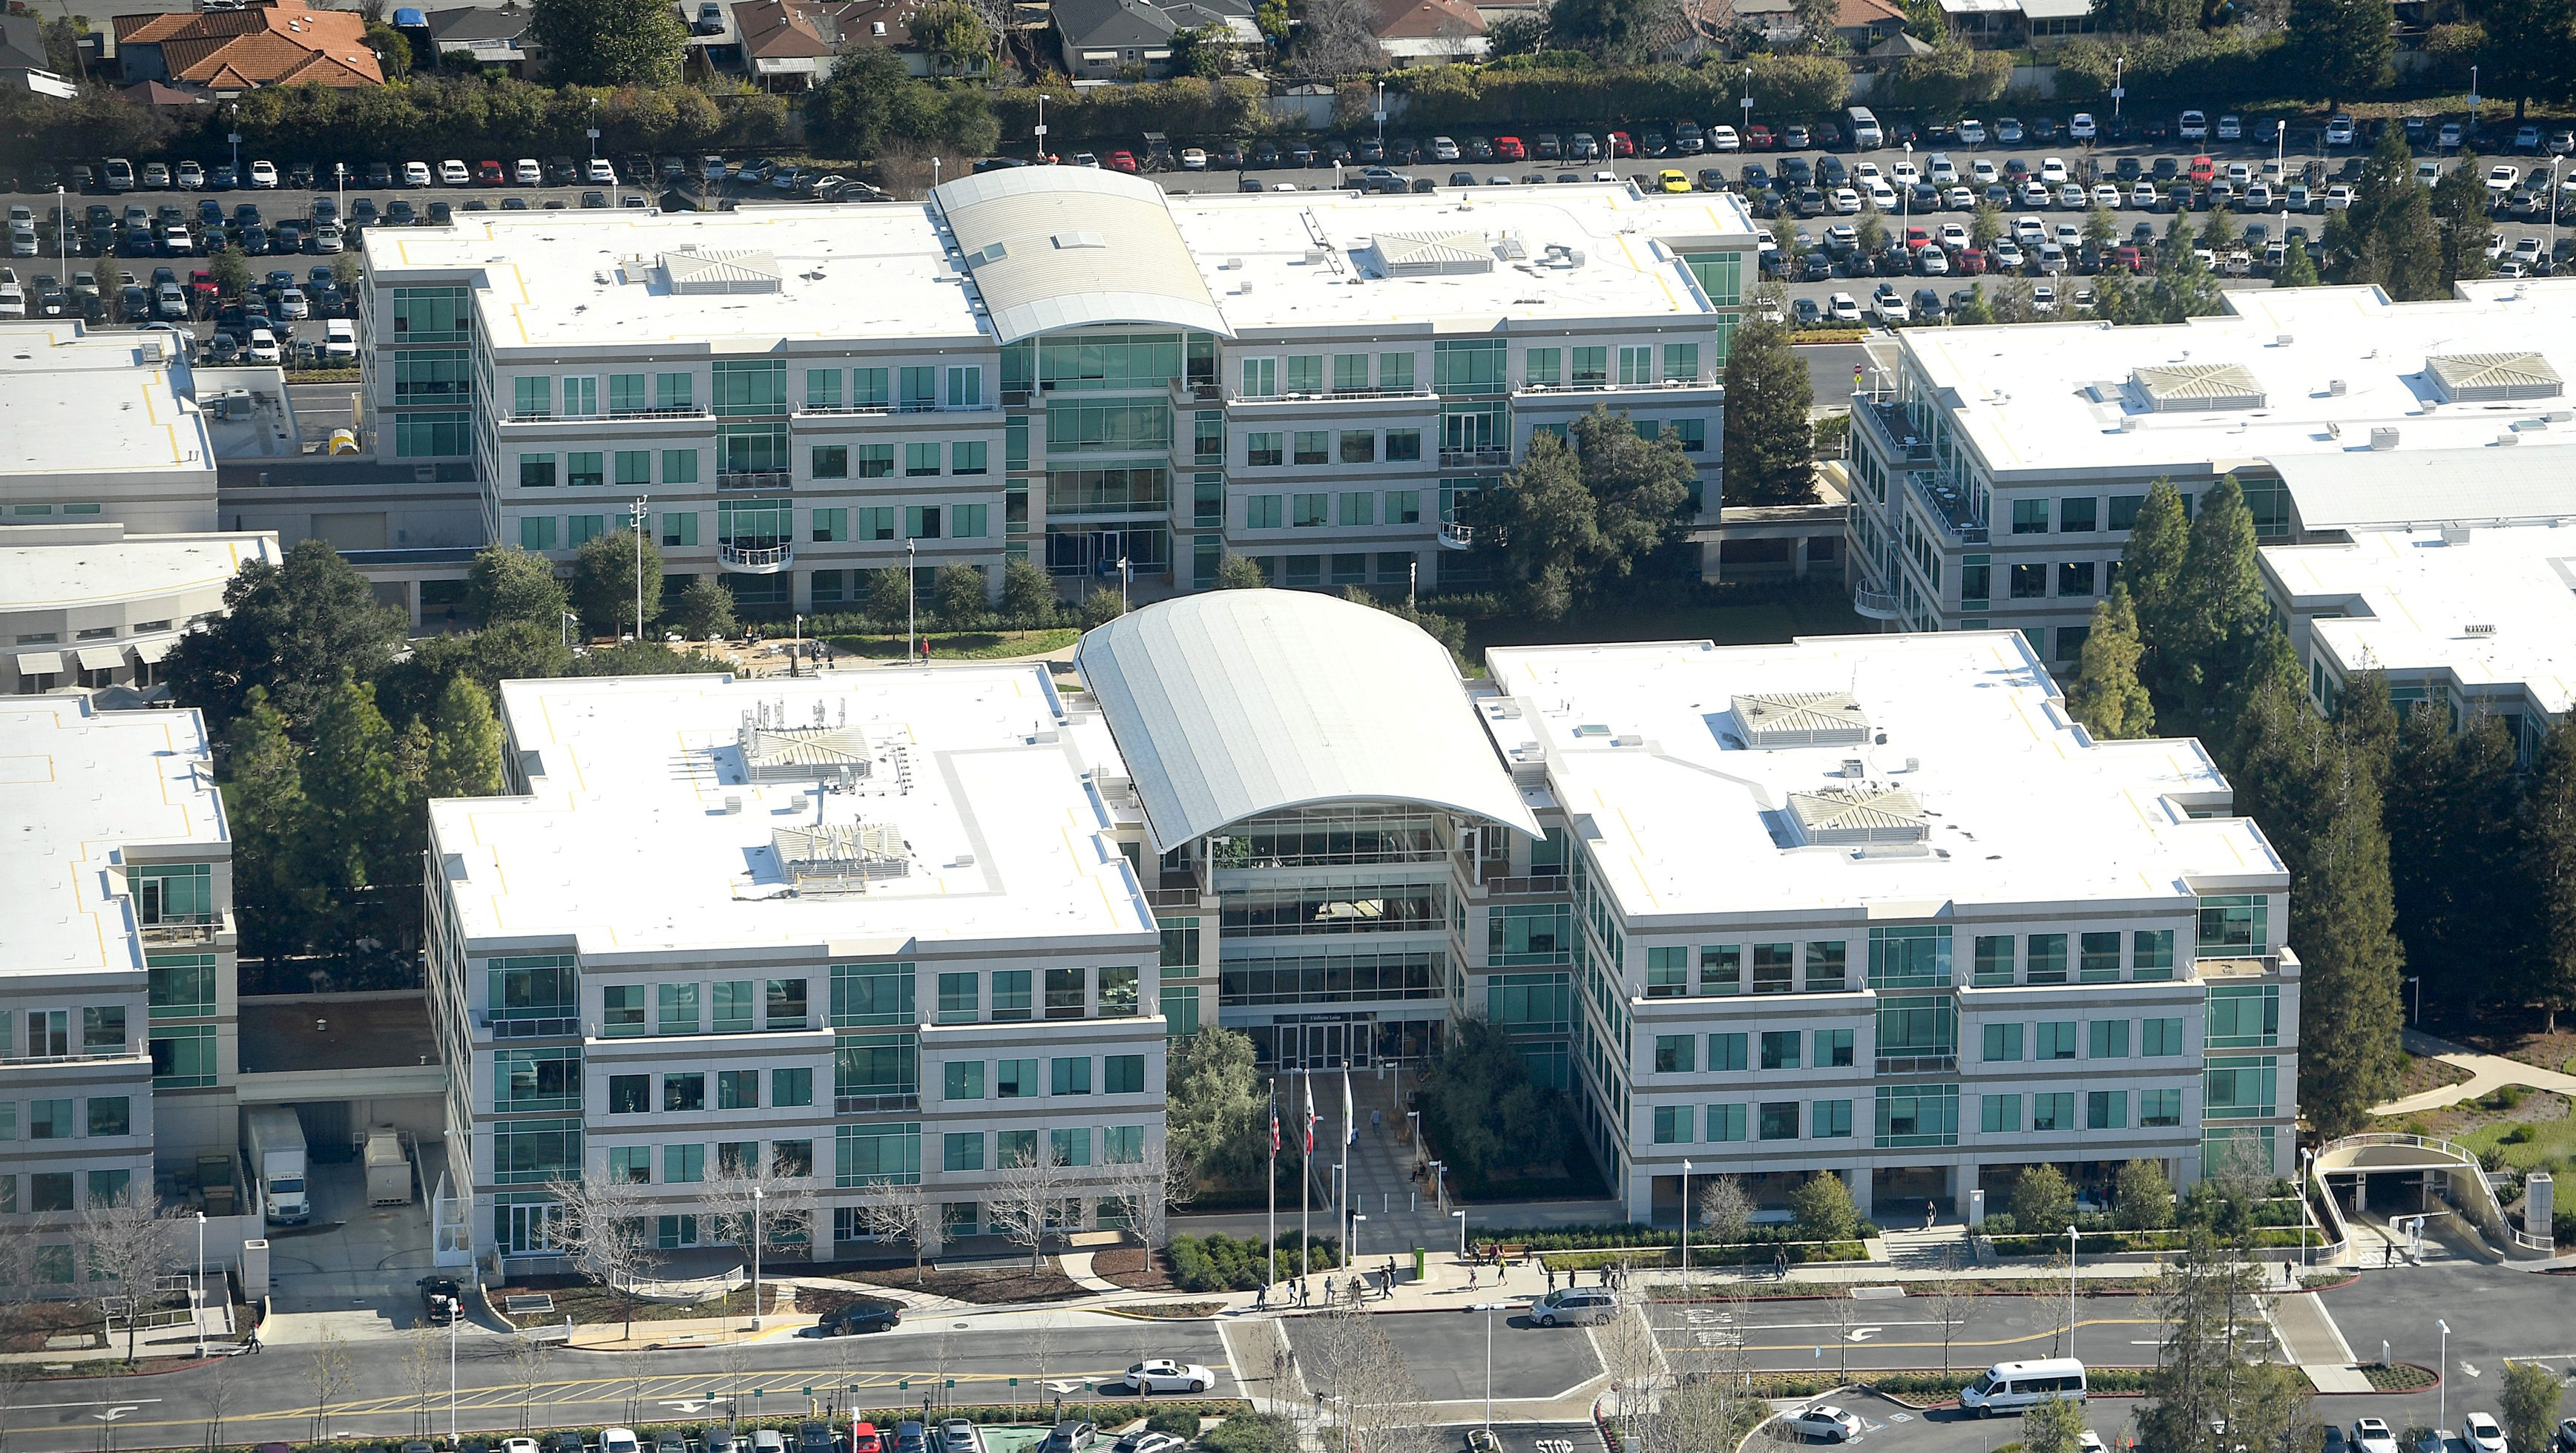 Apple's headquarters in Cupertino, California.